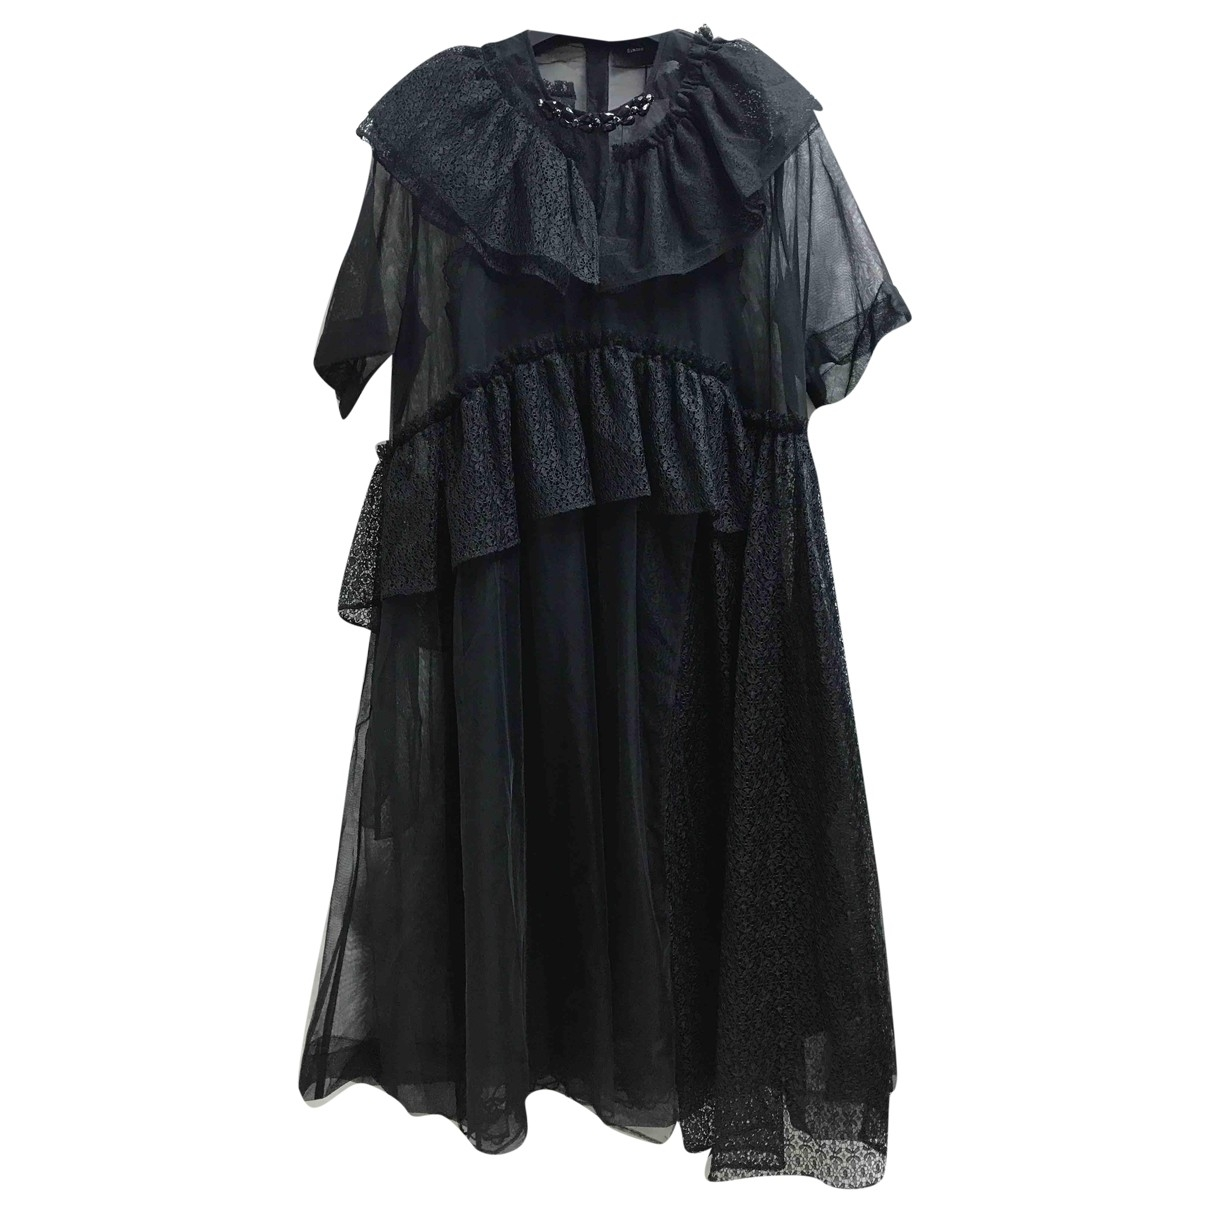 Simone Rocha \N Kleid in  Schwarz Polyester